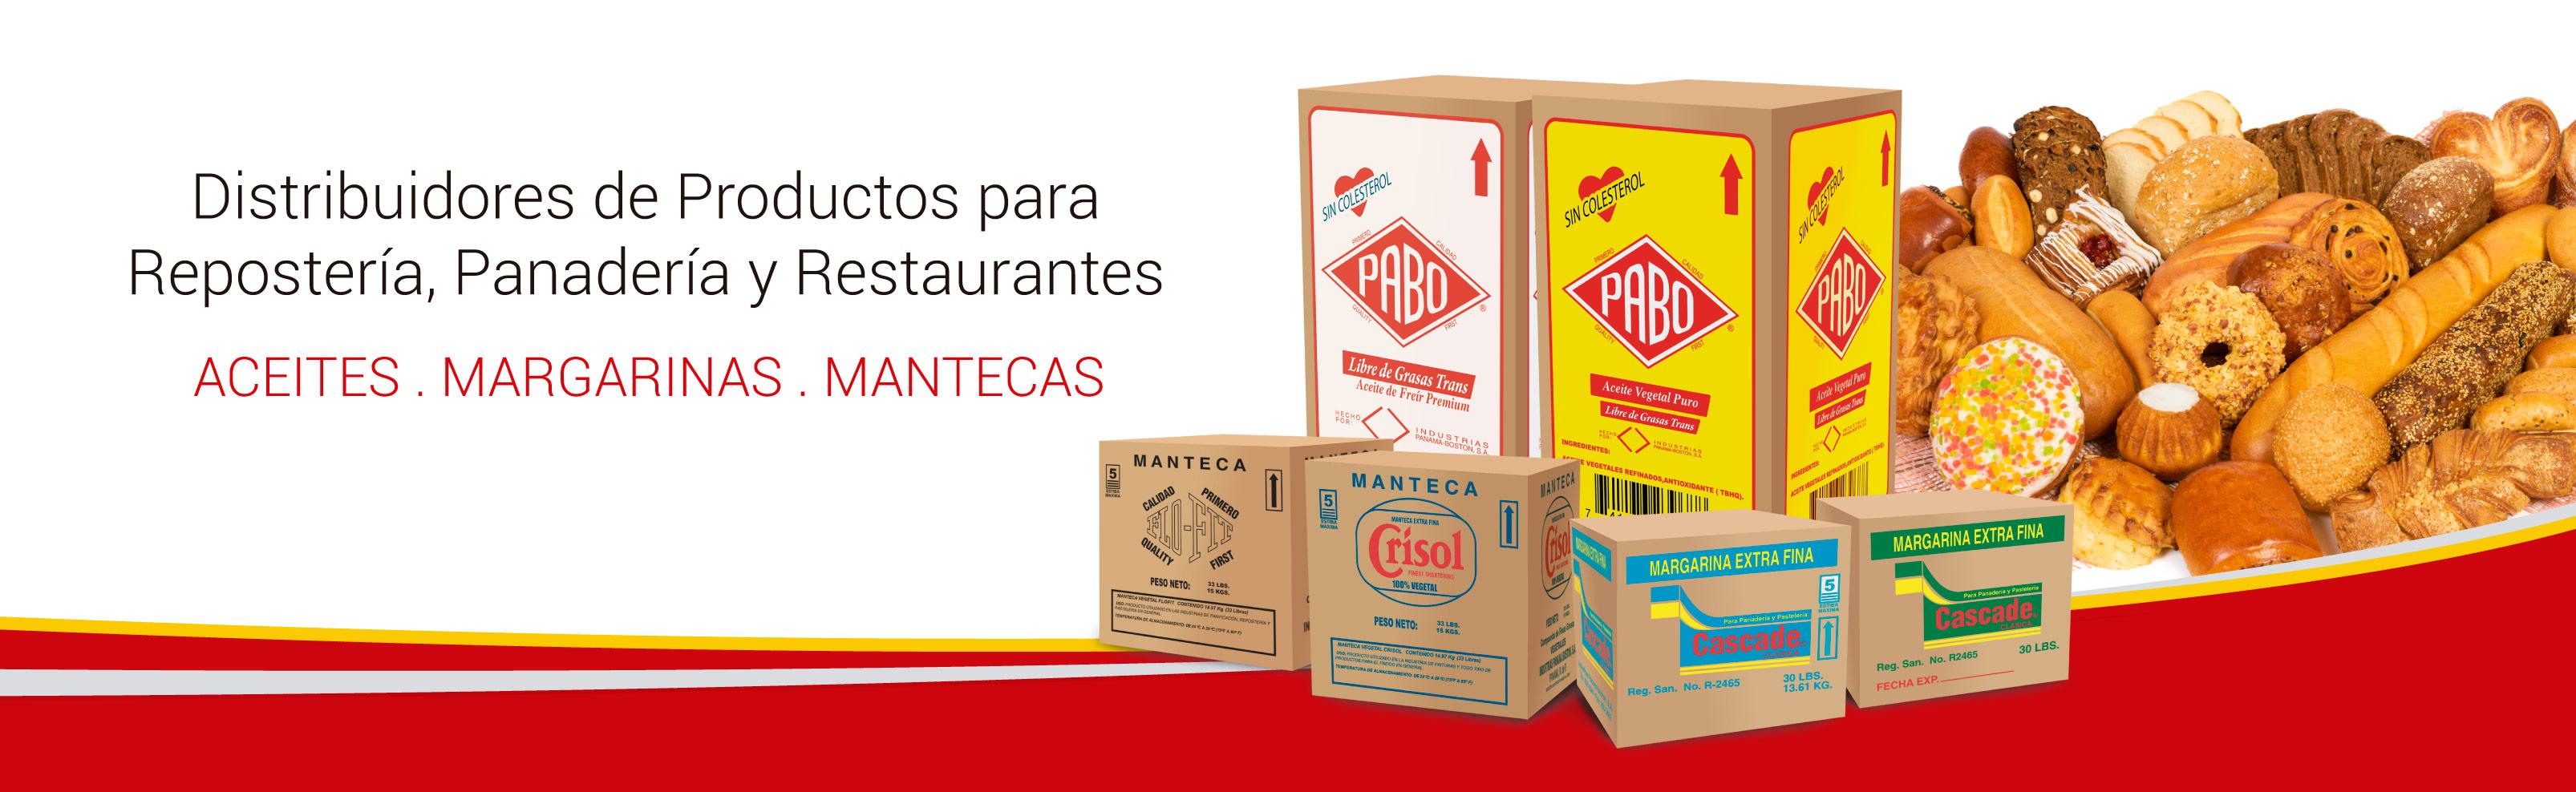 http://www.pabopanama.com/wp-content/uploads/2018/08/food-service.jpg.jpg